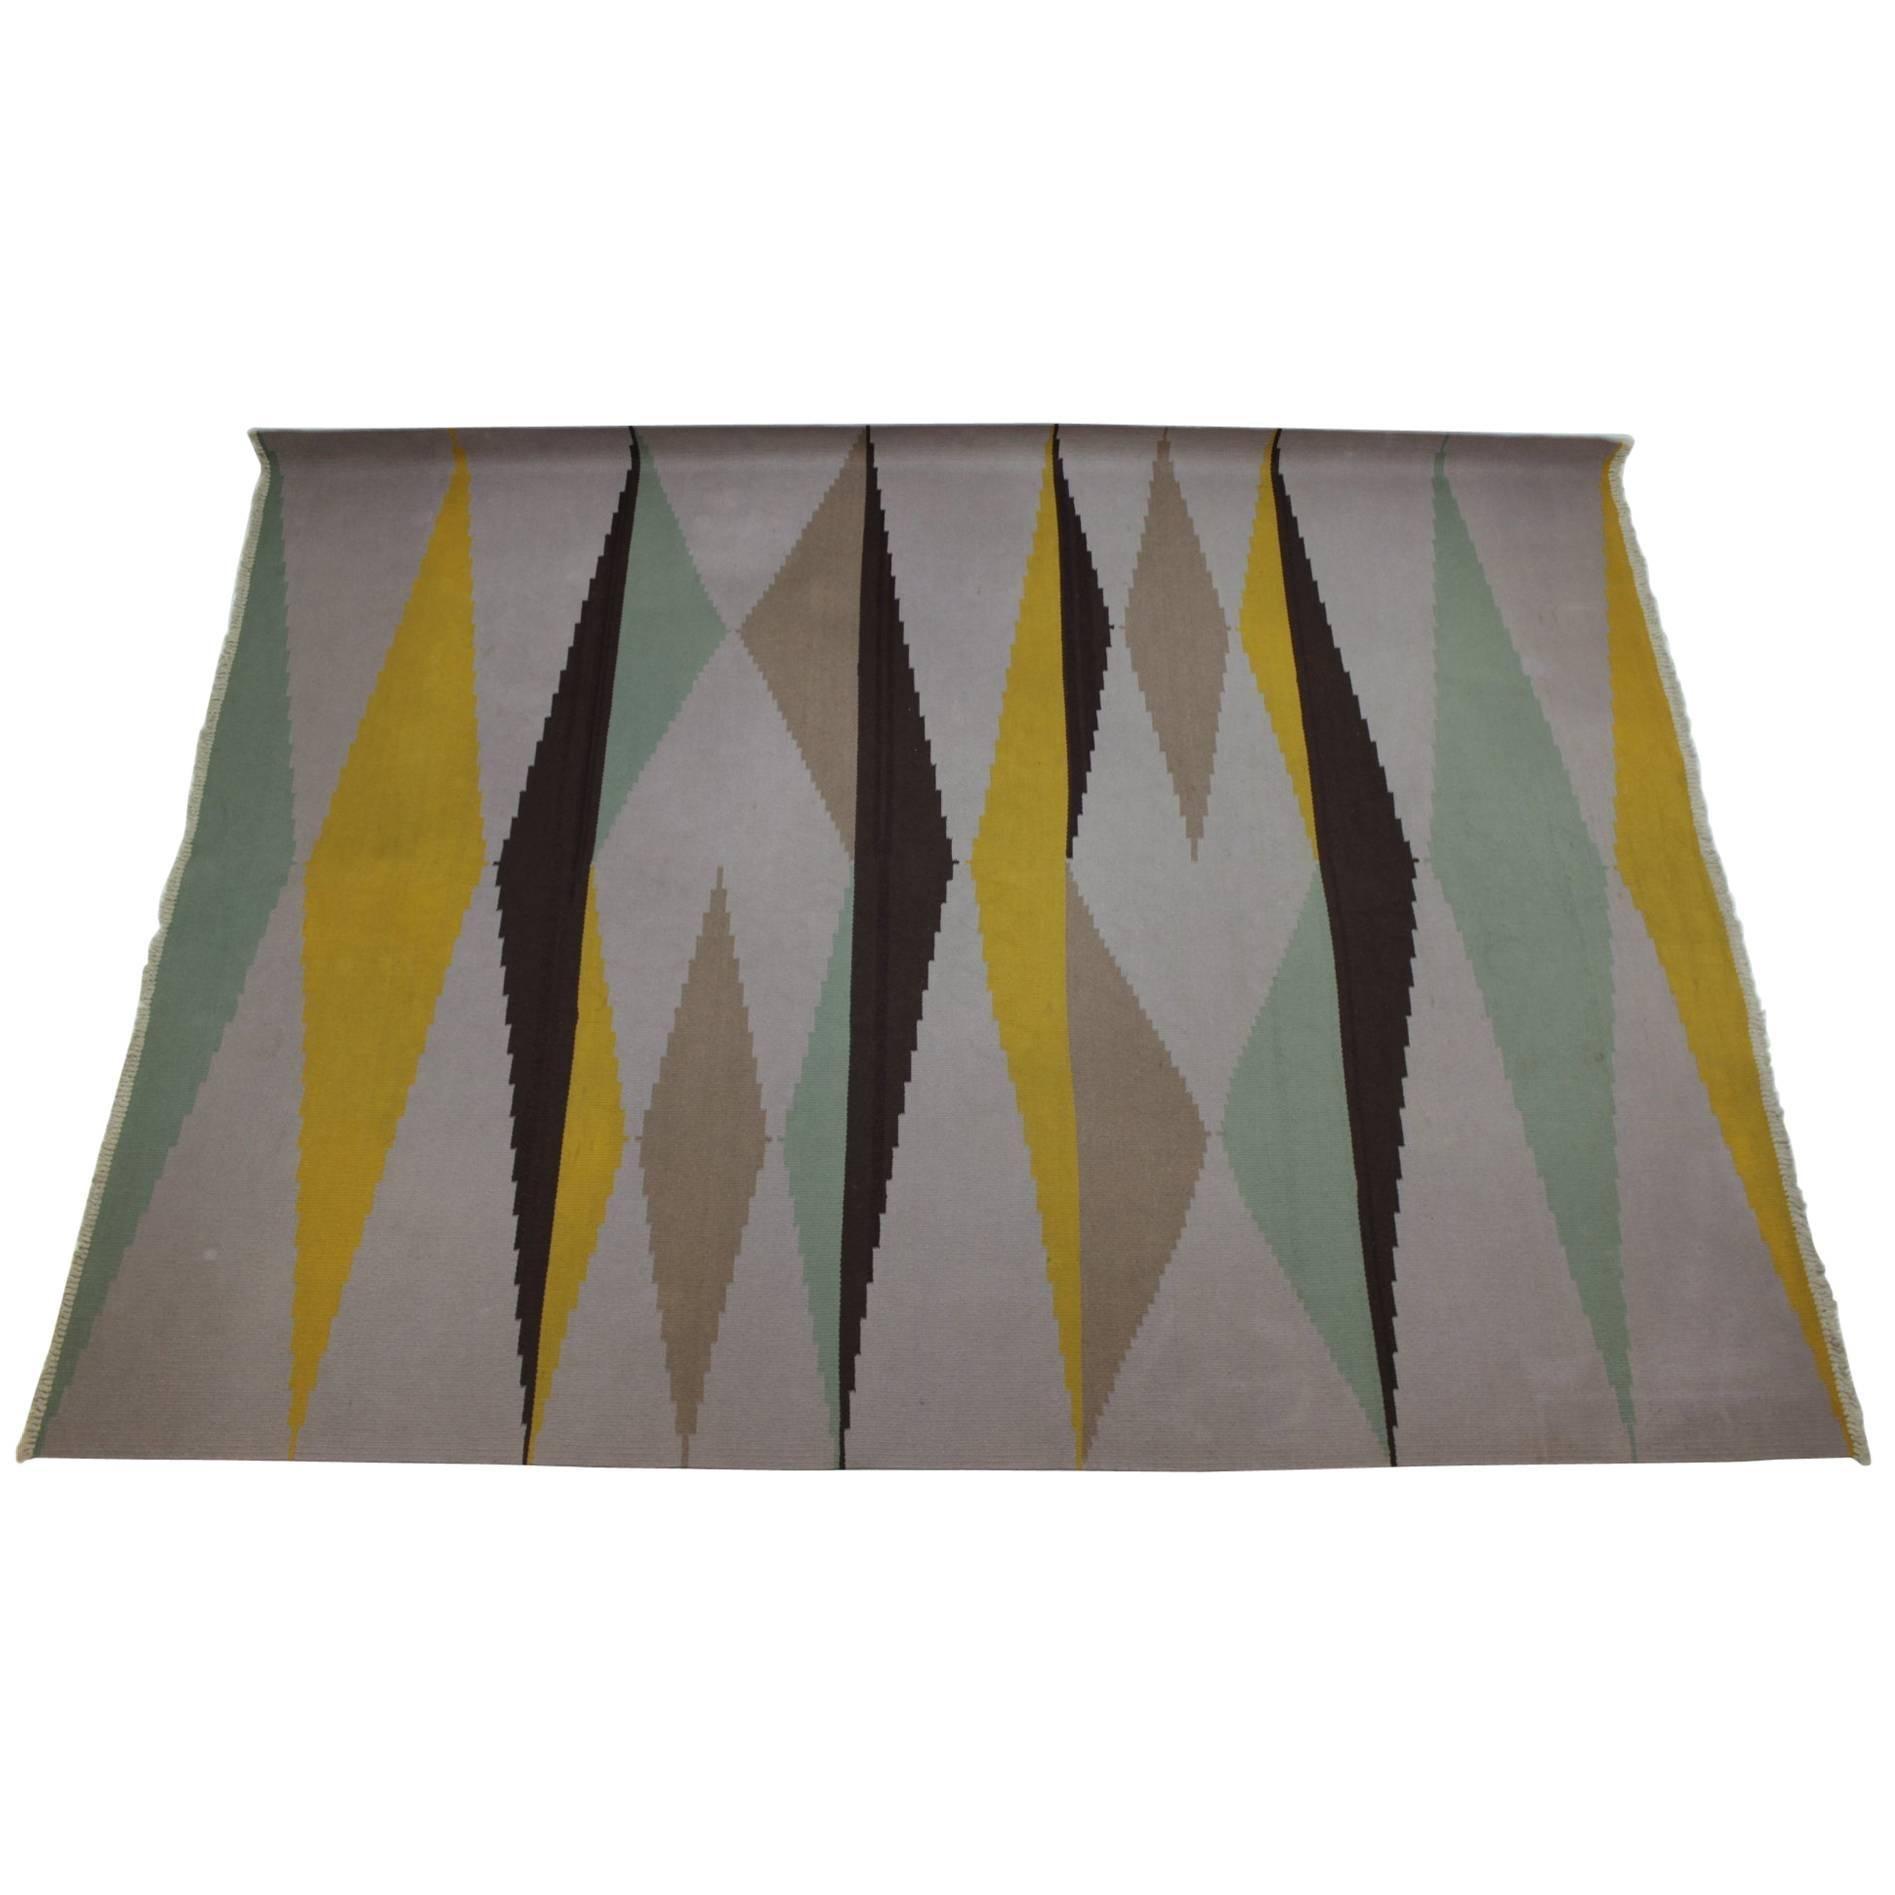 Big Modernist Geometric Kilim Carpet, A. Kybal